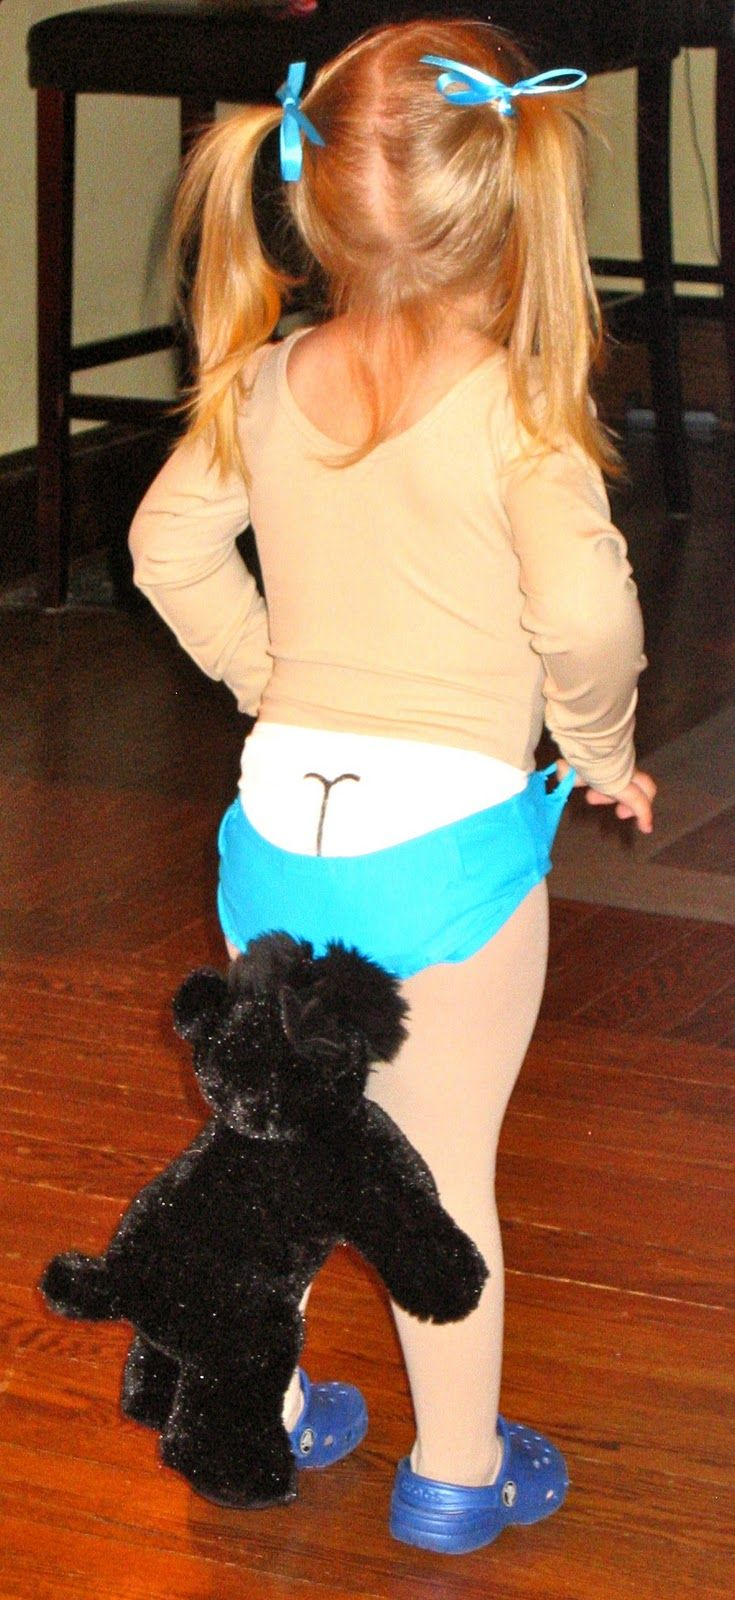 halloween coppertone baby... this cracks me up! ;)